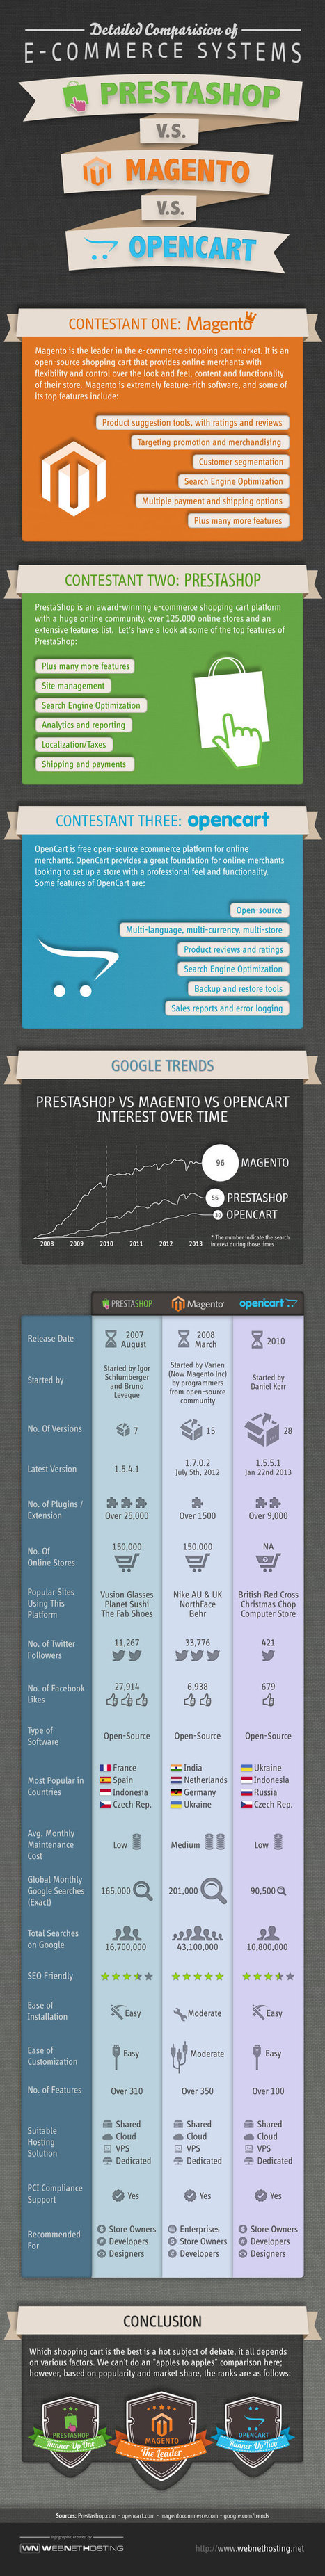 Prestashop vs Magento vs Opencart - Detailed Comparison | Time to Learn | Scoop.it